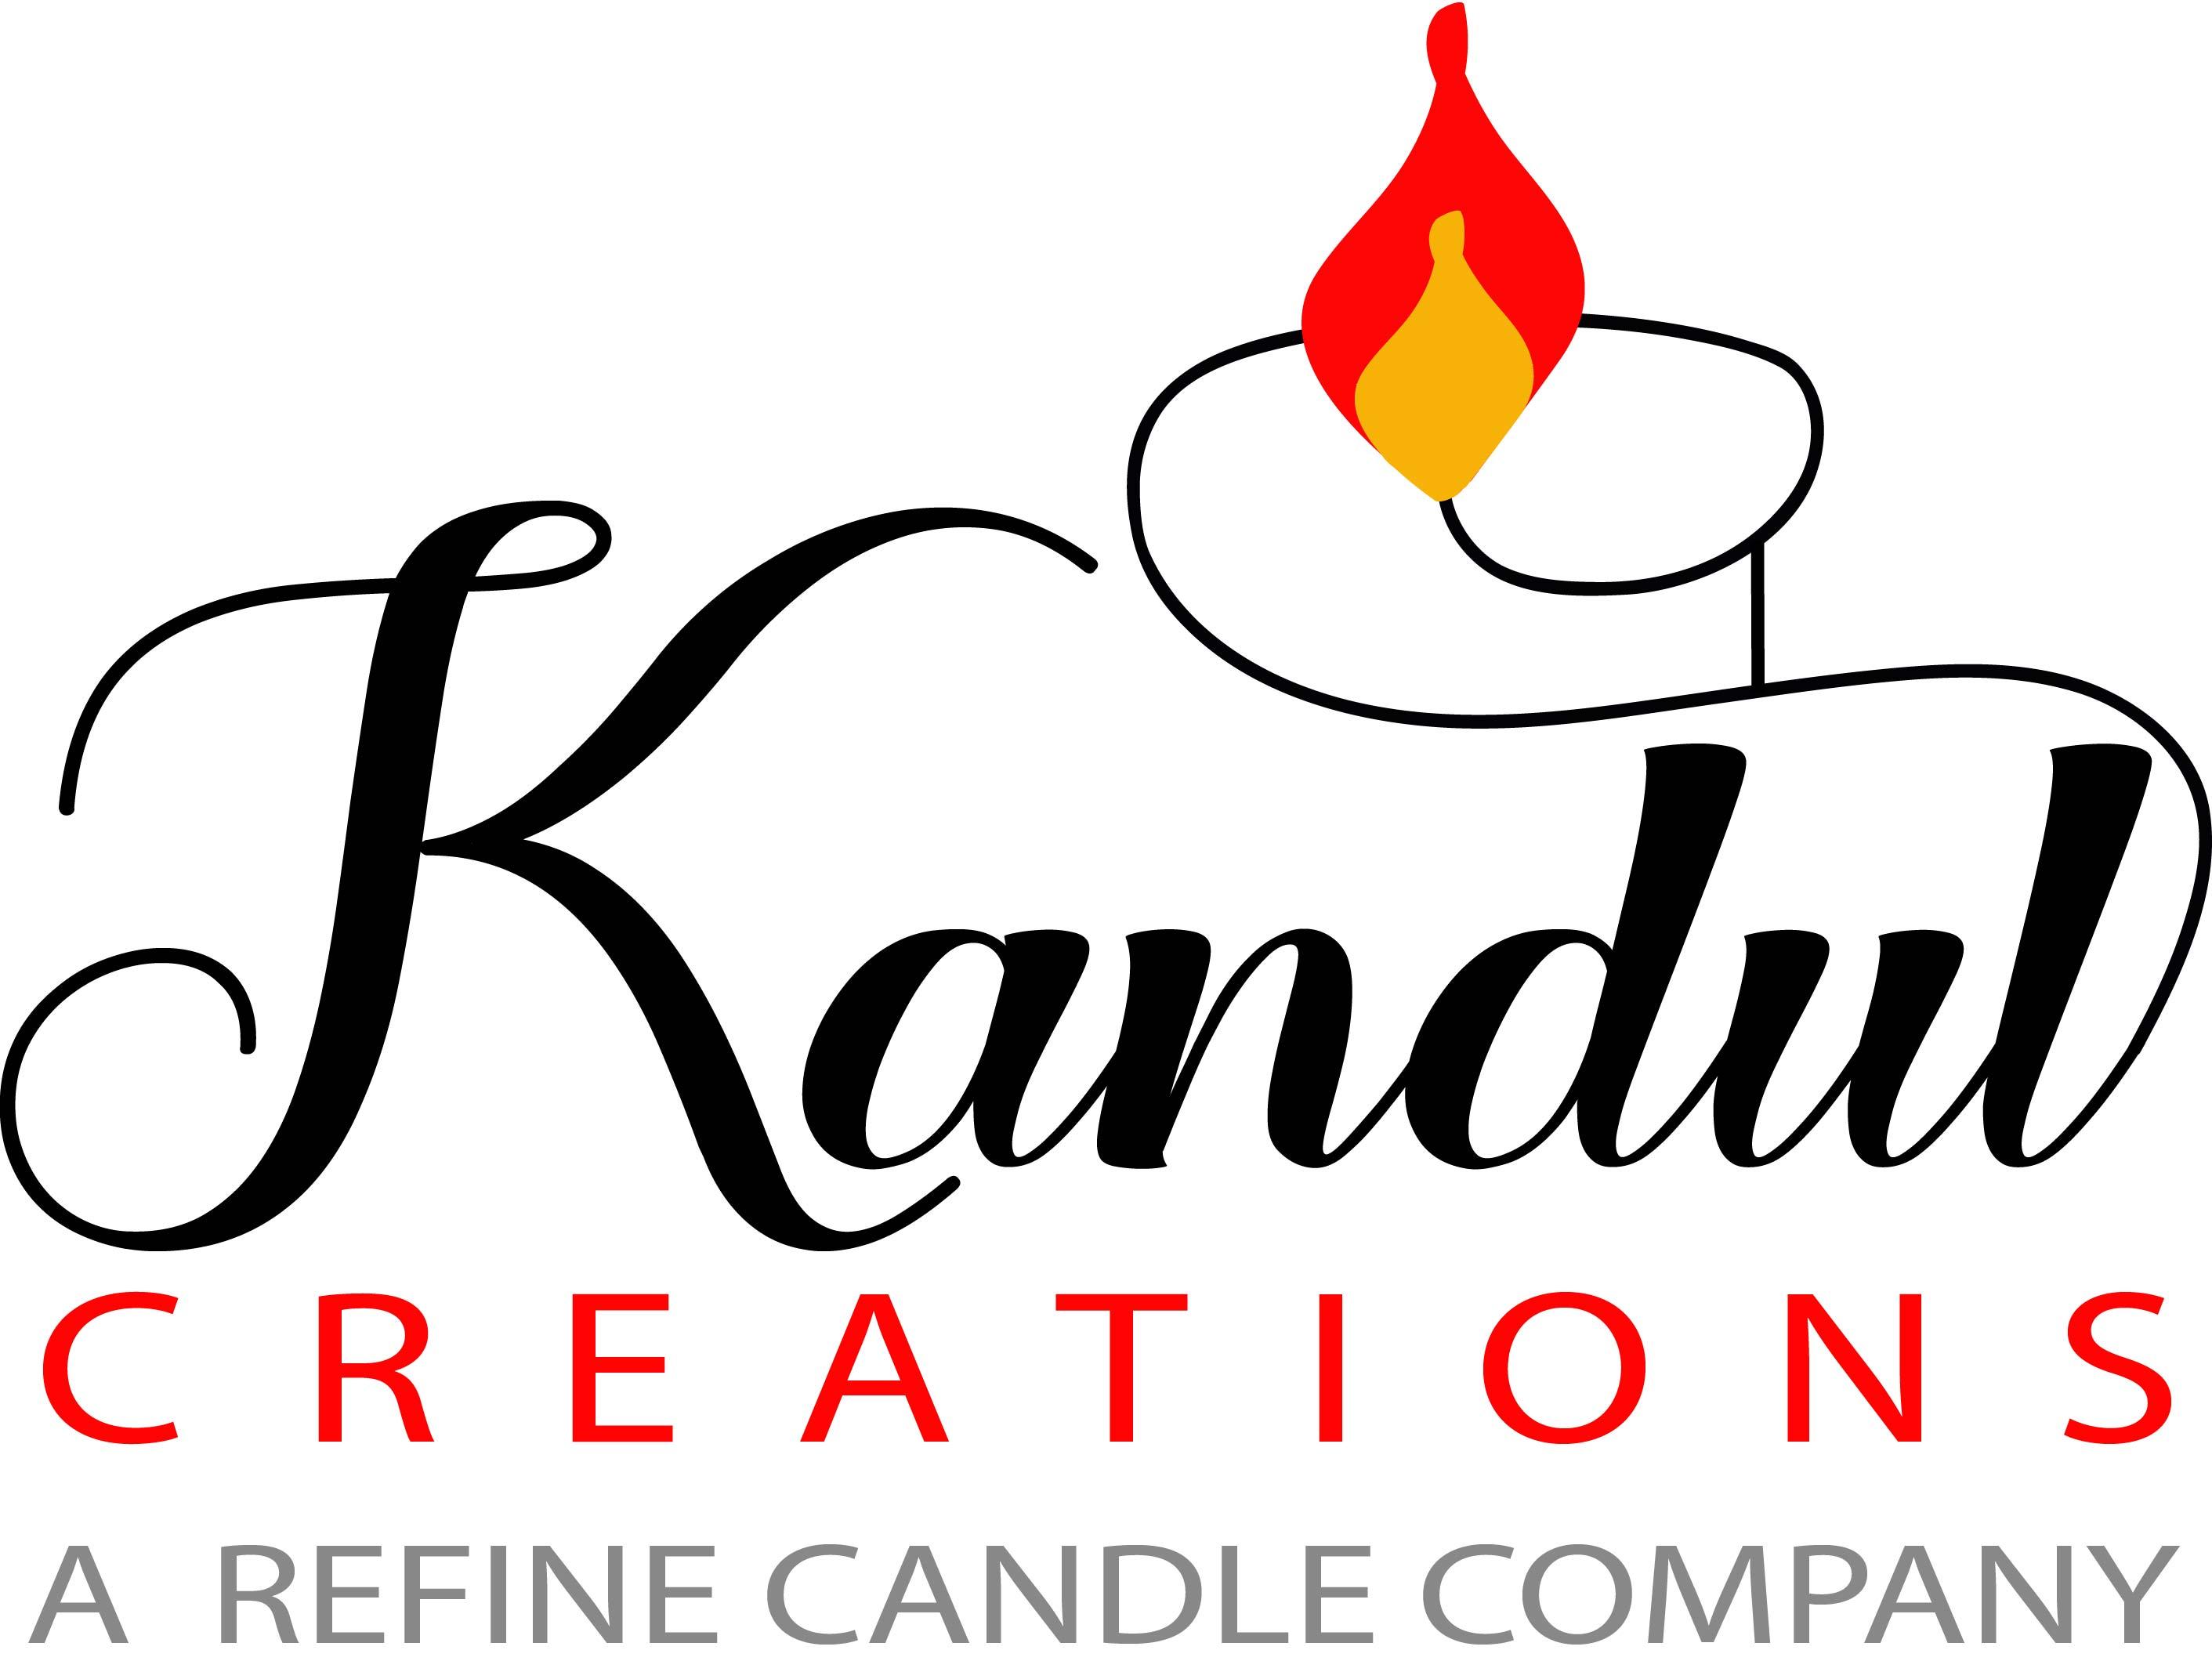 Kandul Creations